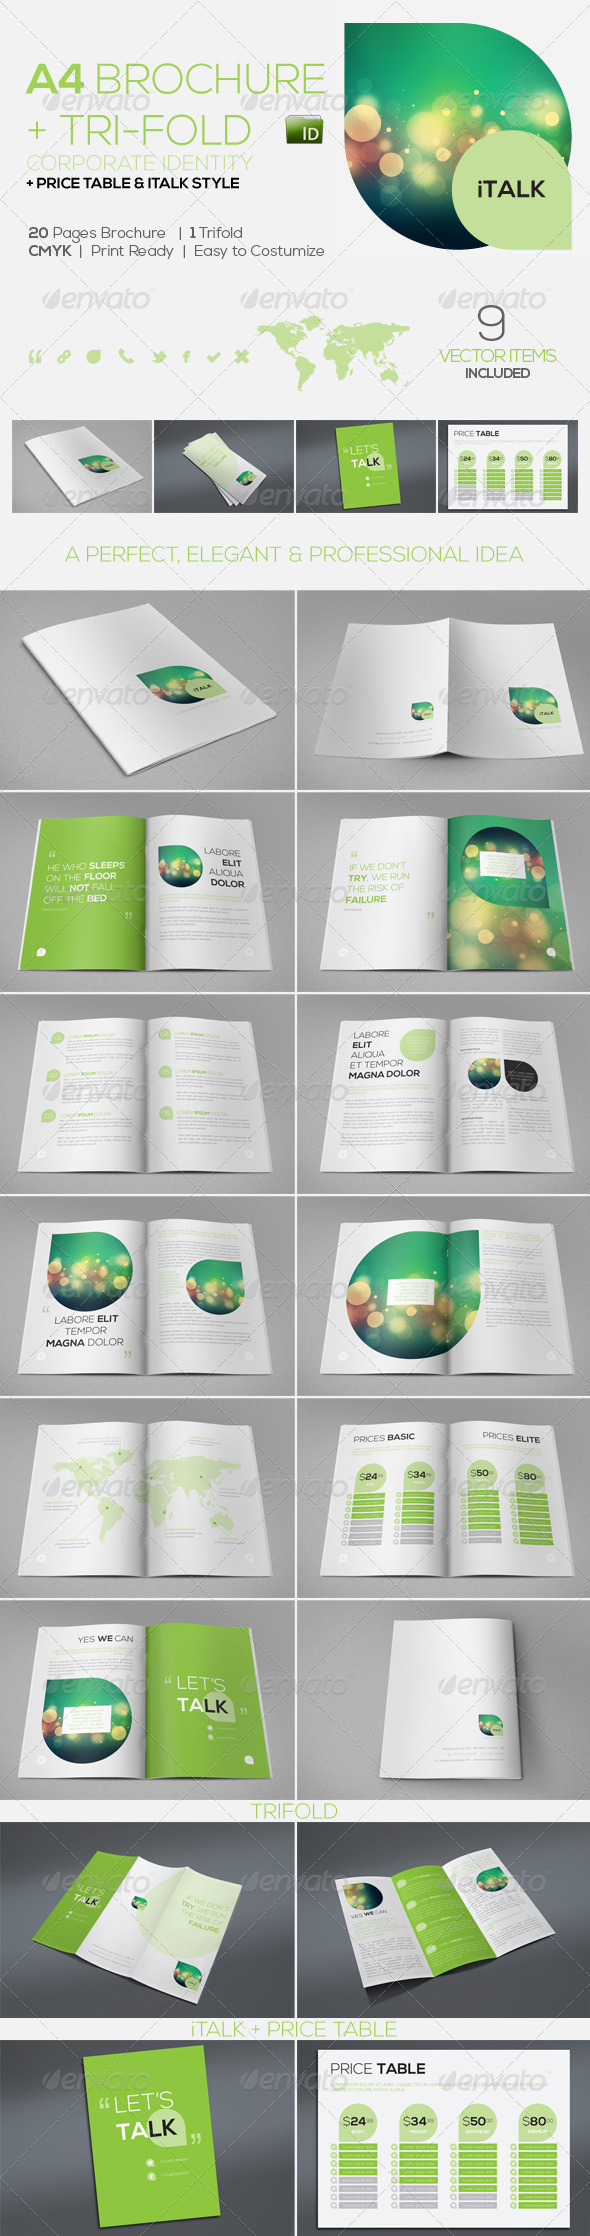 GraphicRiver iTalk Elegant Corporate Identity Brochure &&& 3097843